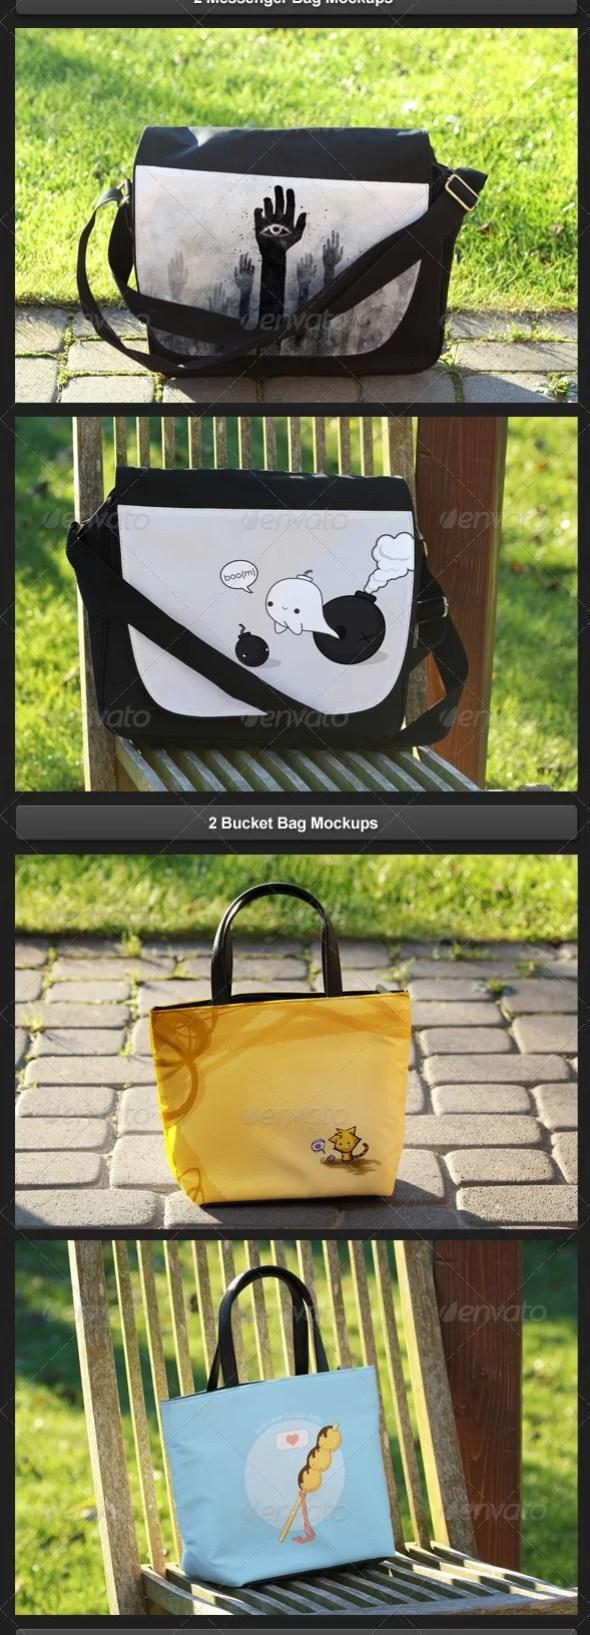 Realistic Bag Mockups